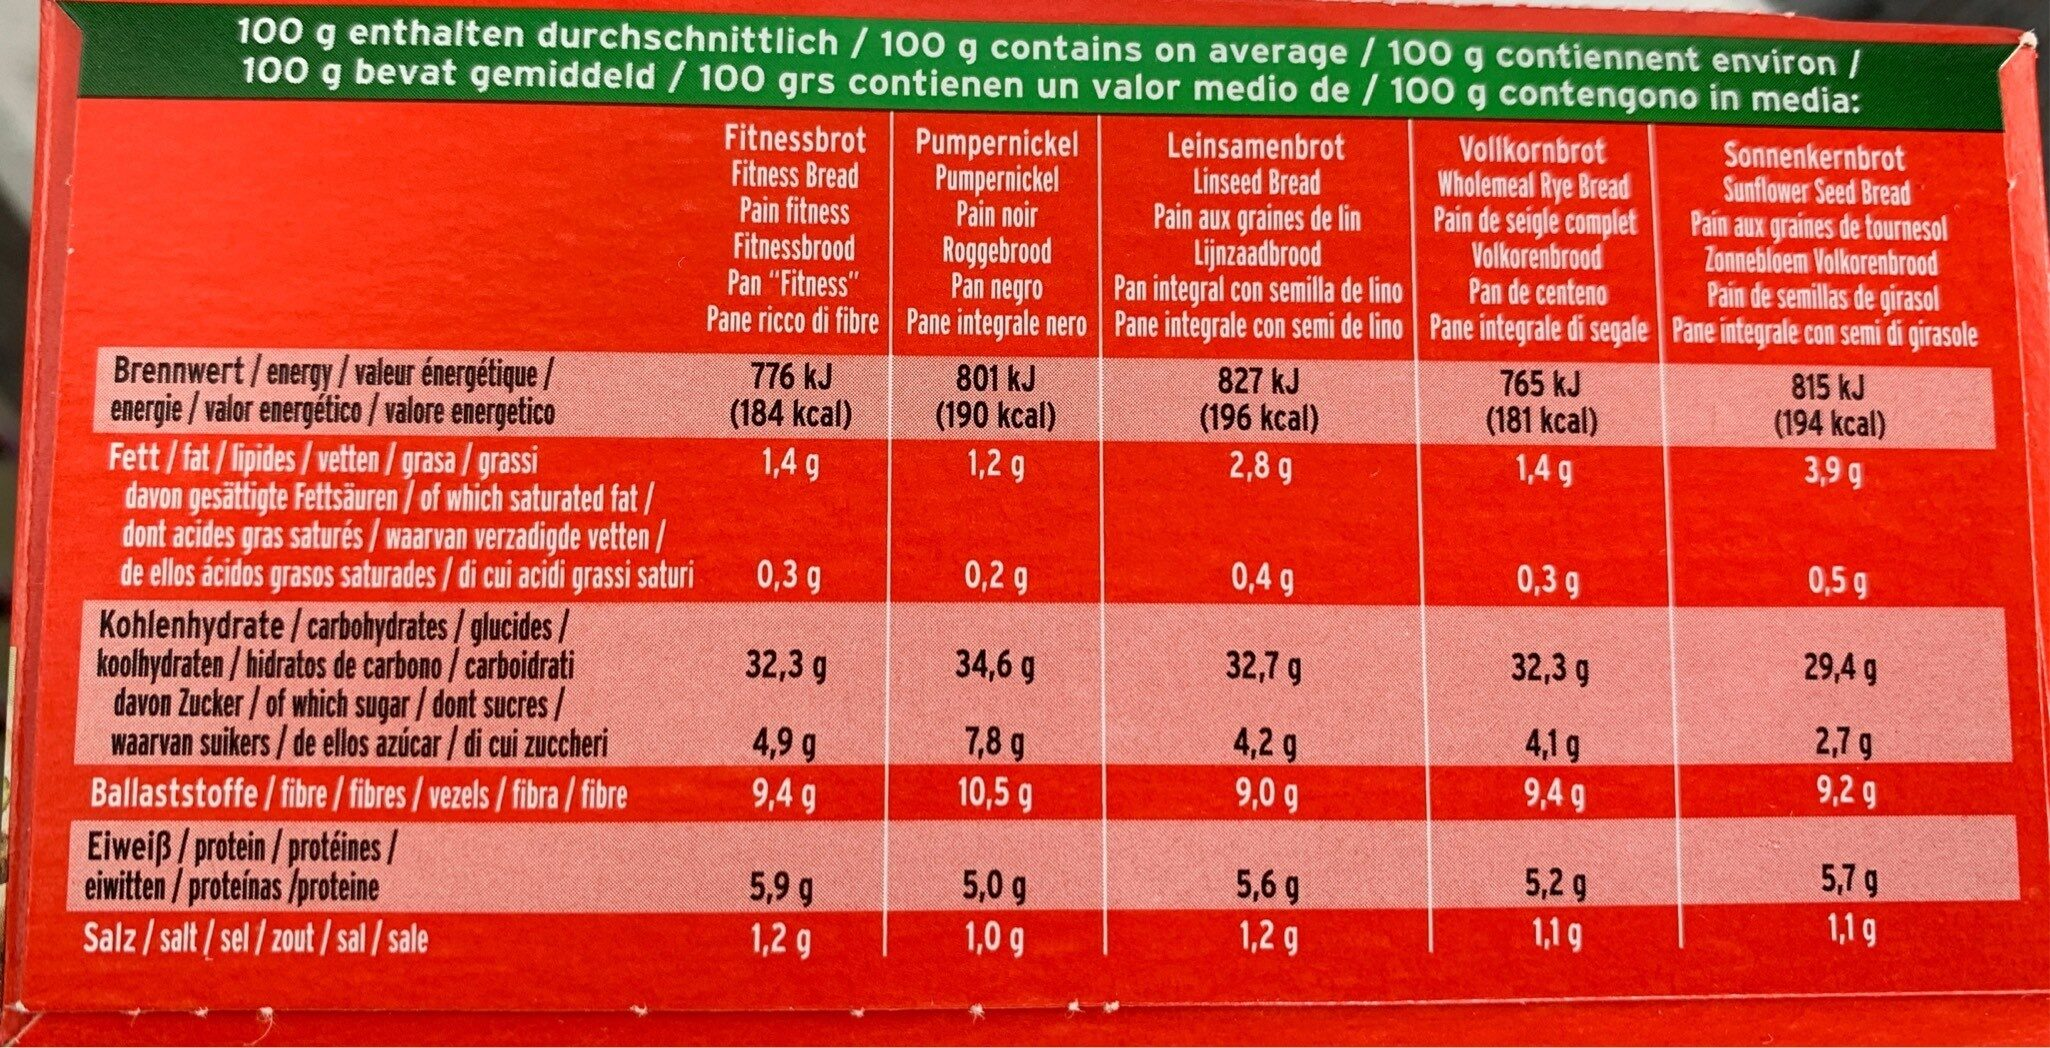 Mestemacher Premium Vollkorn Brotkorb - Informazioni nutrizionali - fr